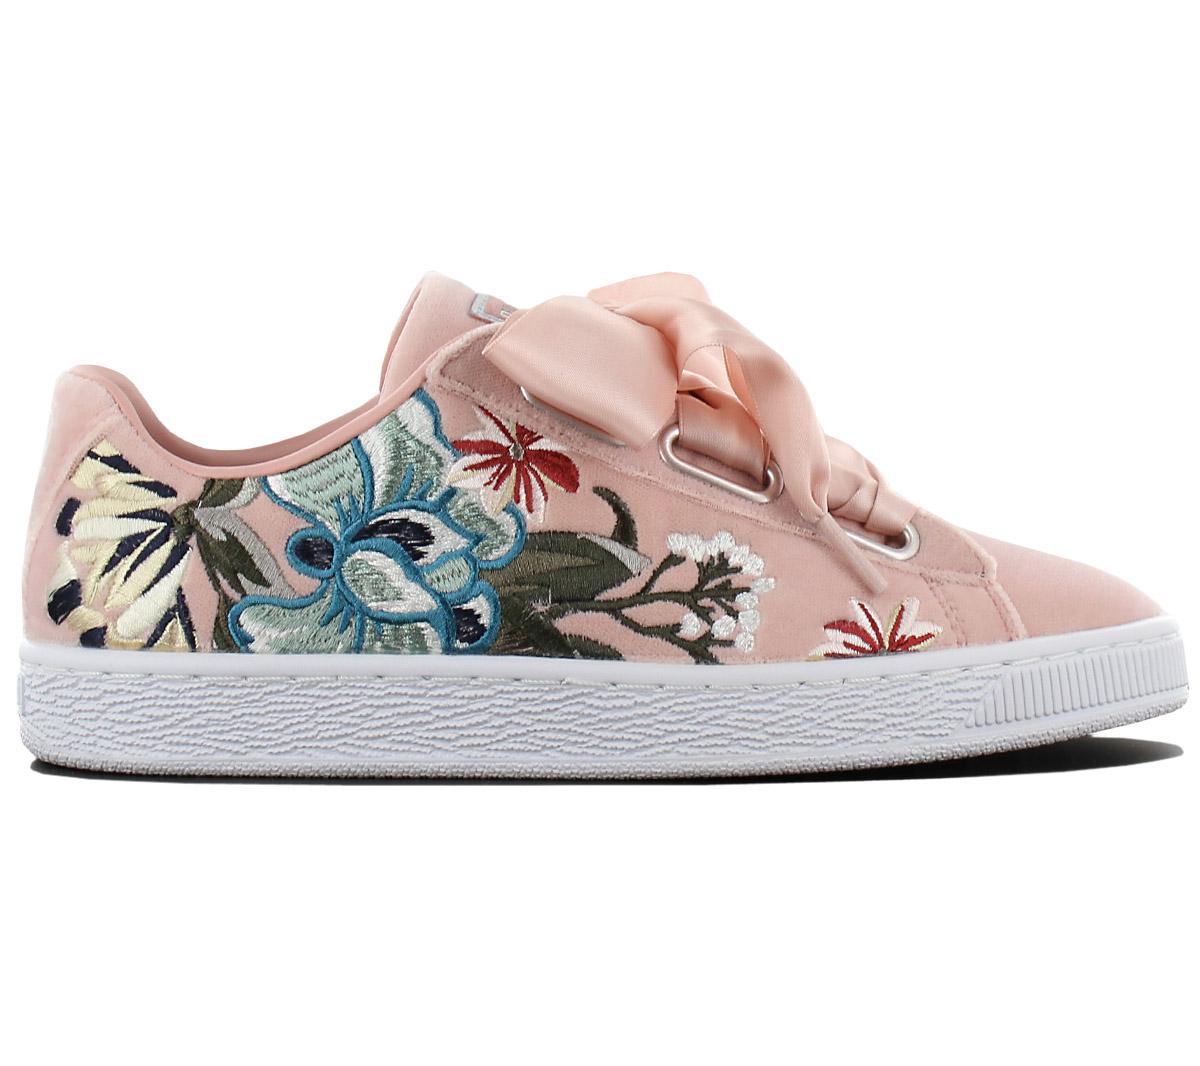 c929fdea030840 Puma Basket Heart Hyper Flower Emb Ladies Trainers Shoes